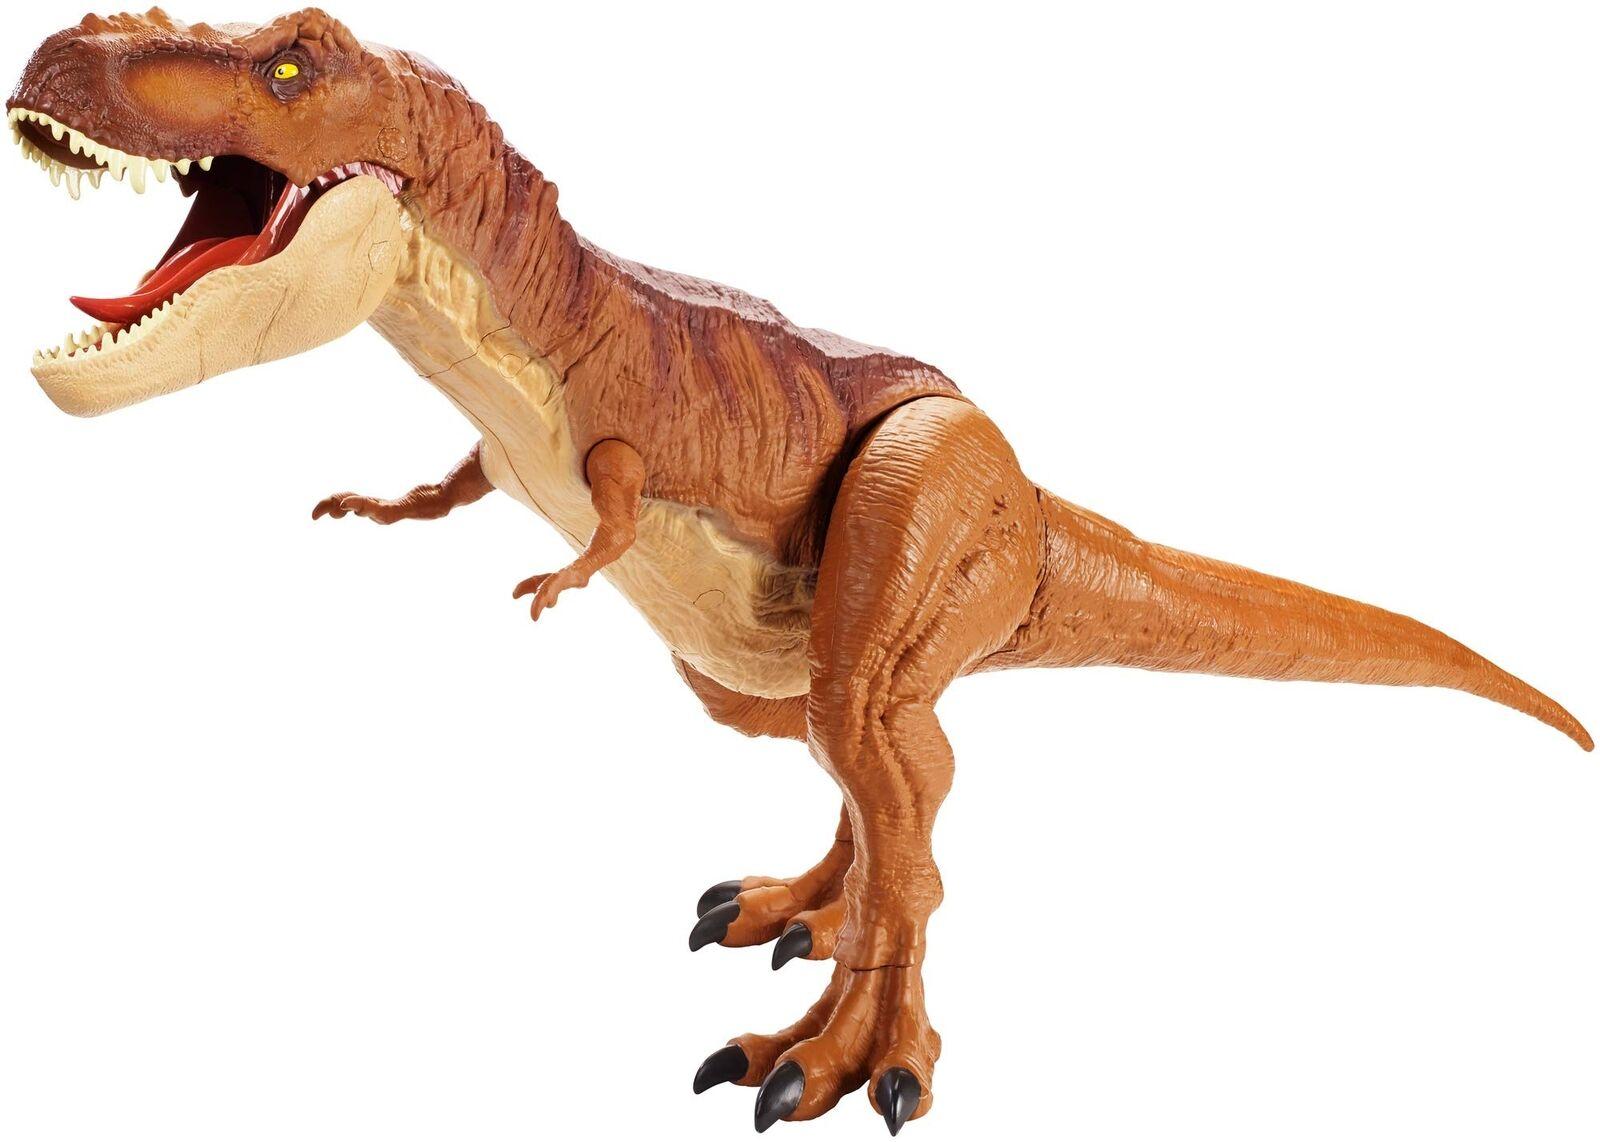 Jurassic welt super riesige tyrannosaurus rex.